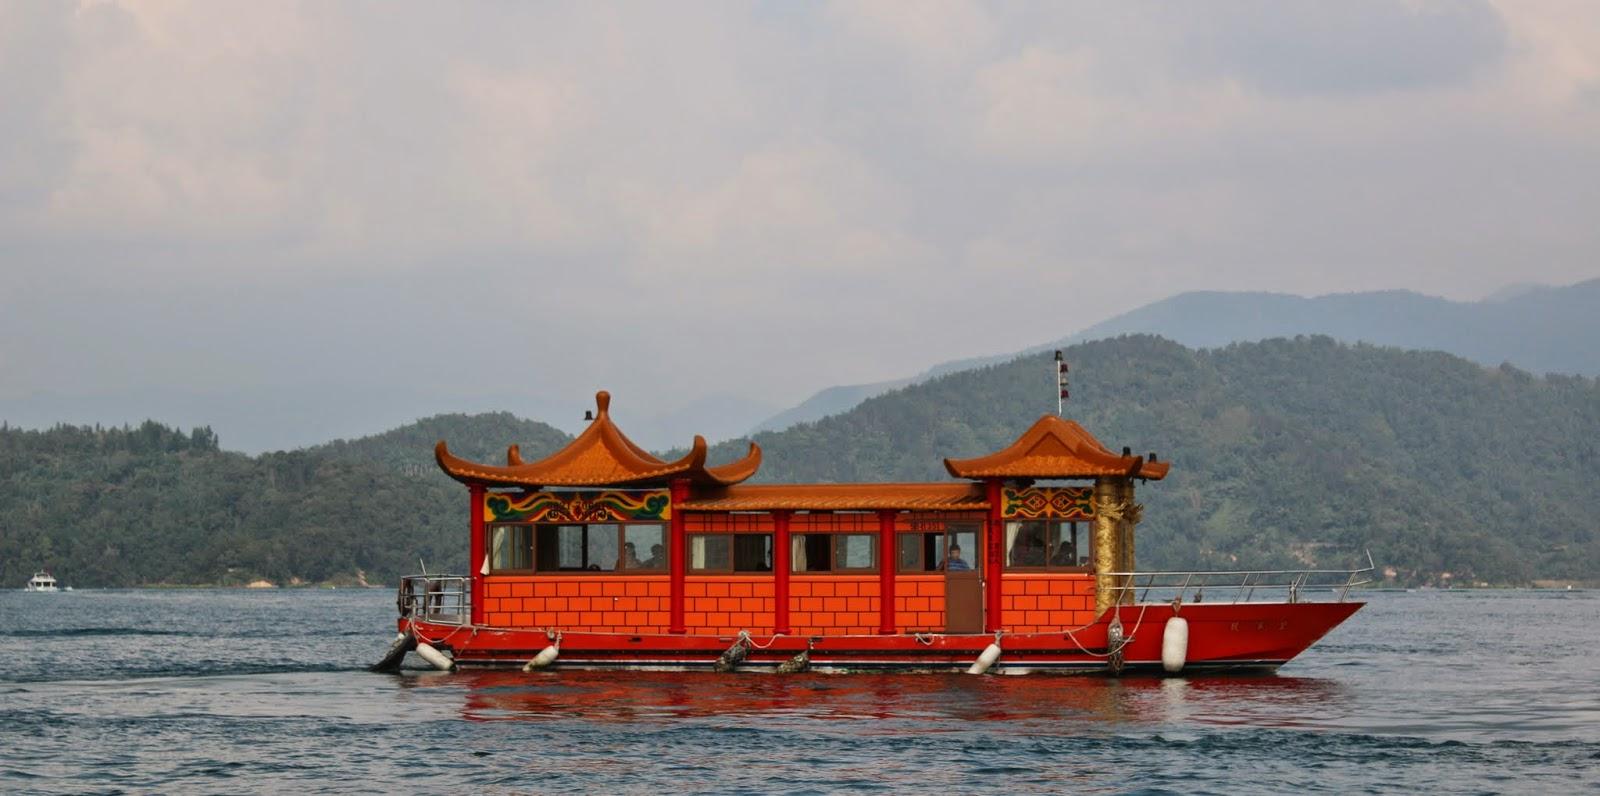 A beautiful Chinese Junk Boat can be seen along Sun Moon Lake in Taiwan